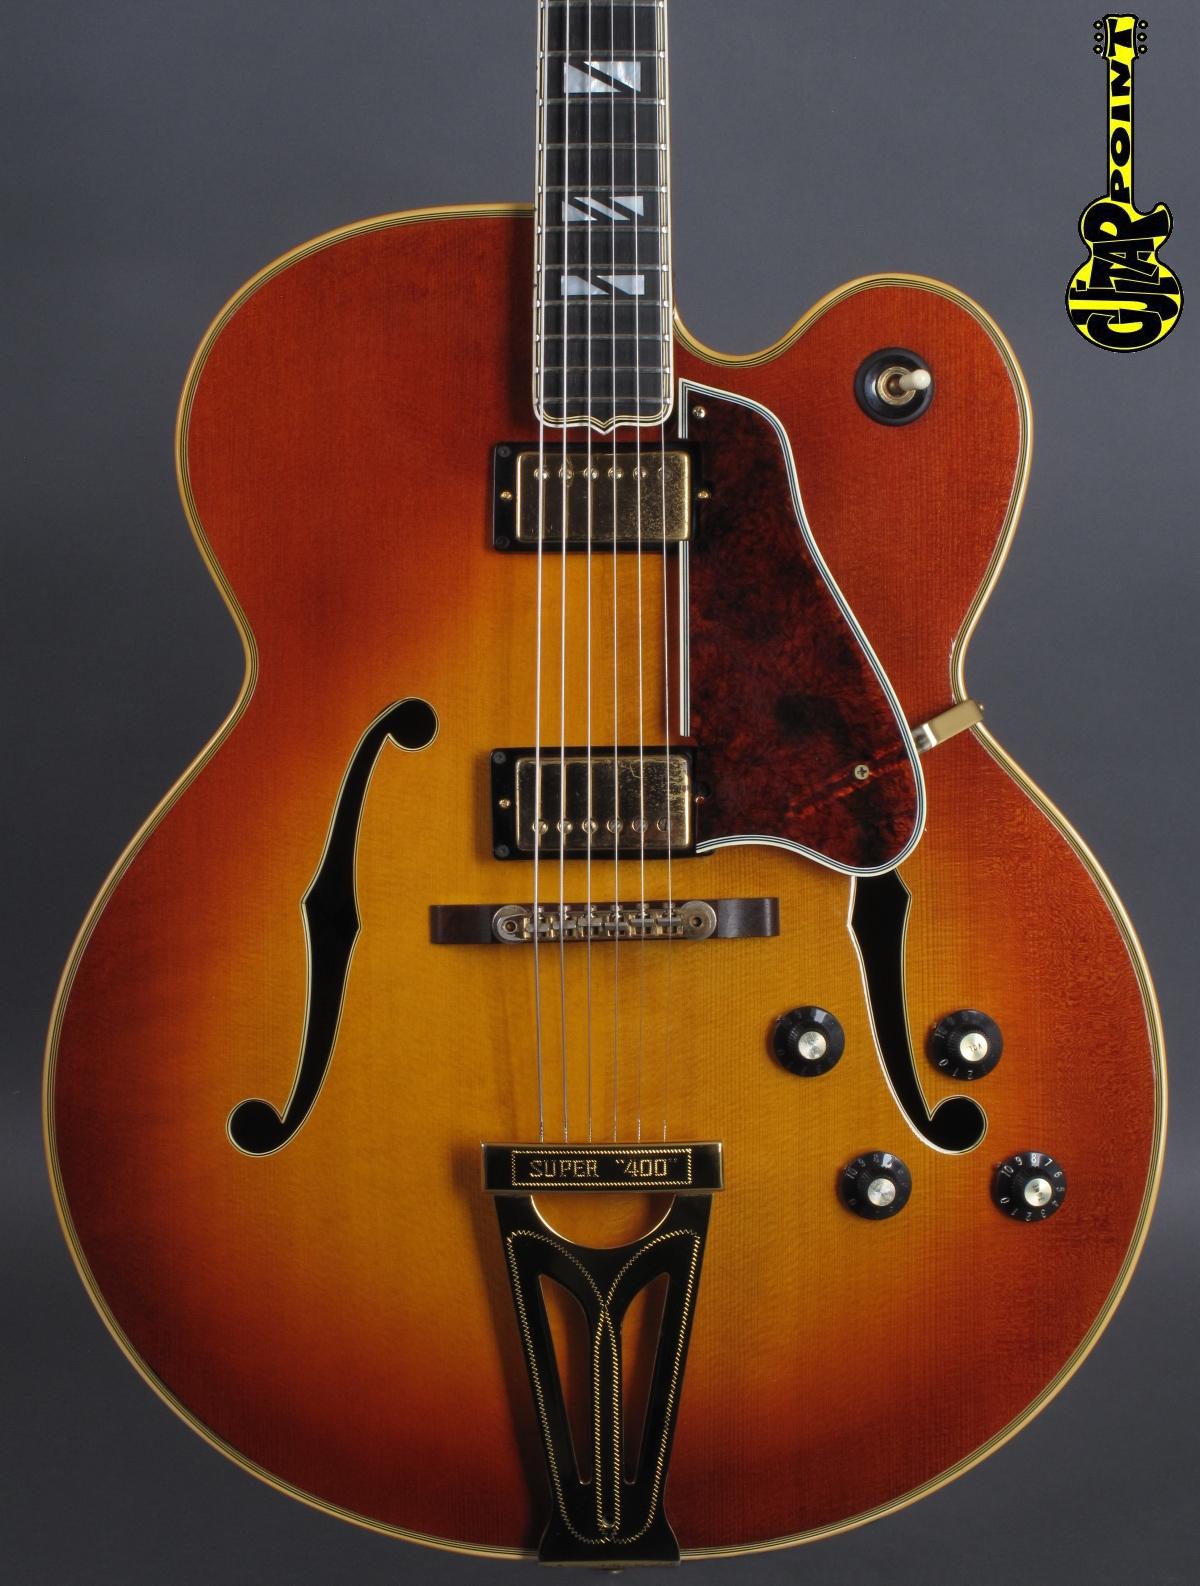 1974 Gibson Super 400 CES - Sunburst